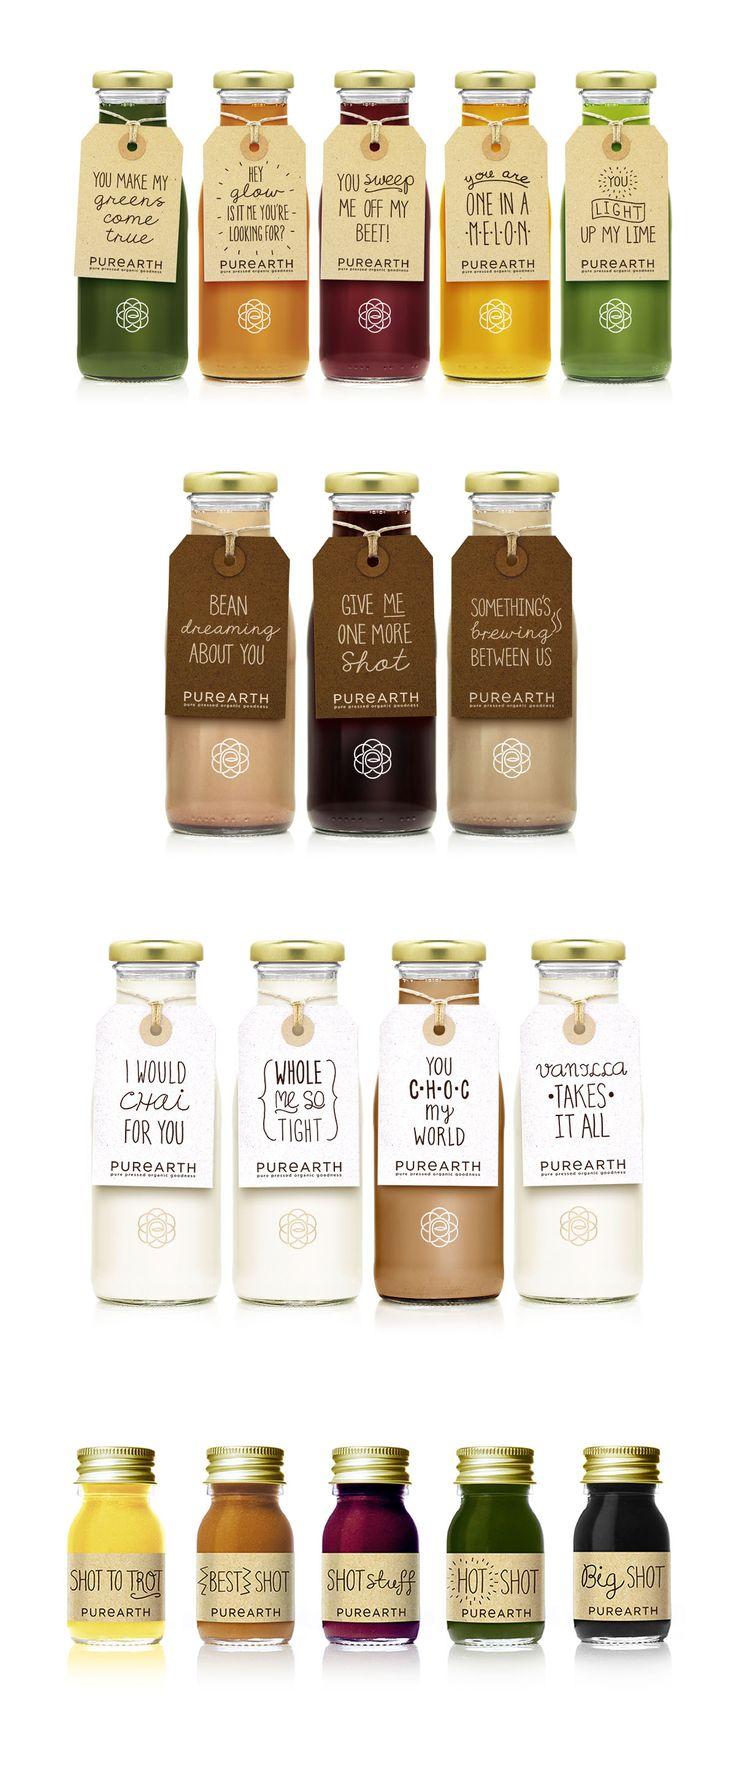 Purearth Packaging Design